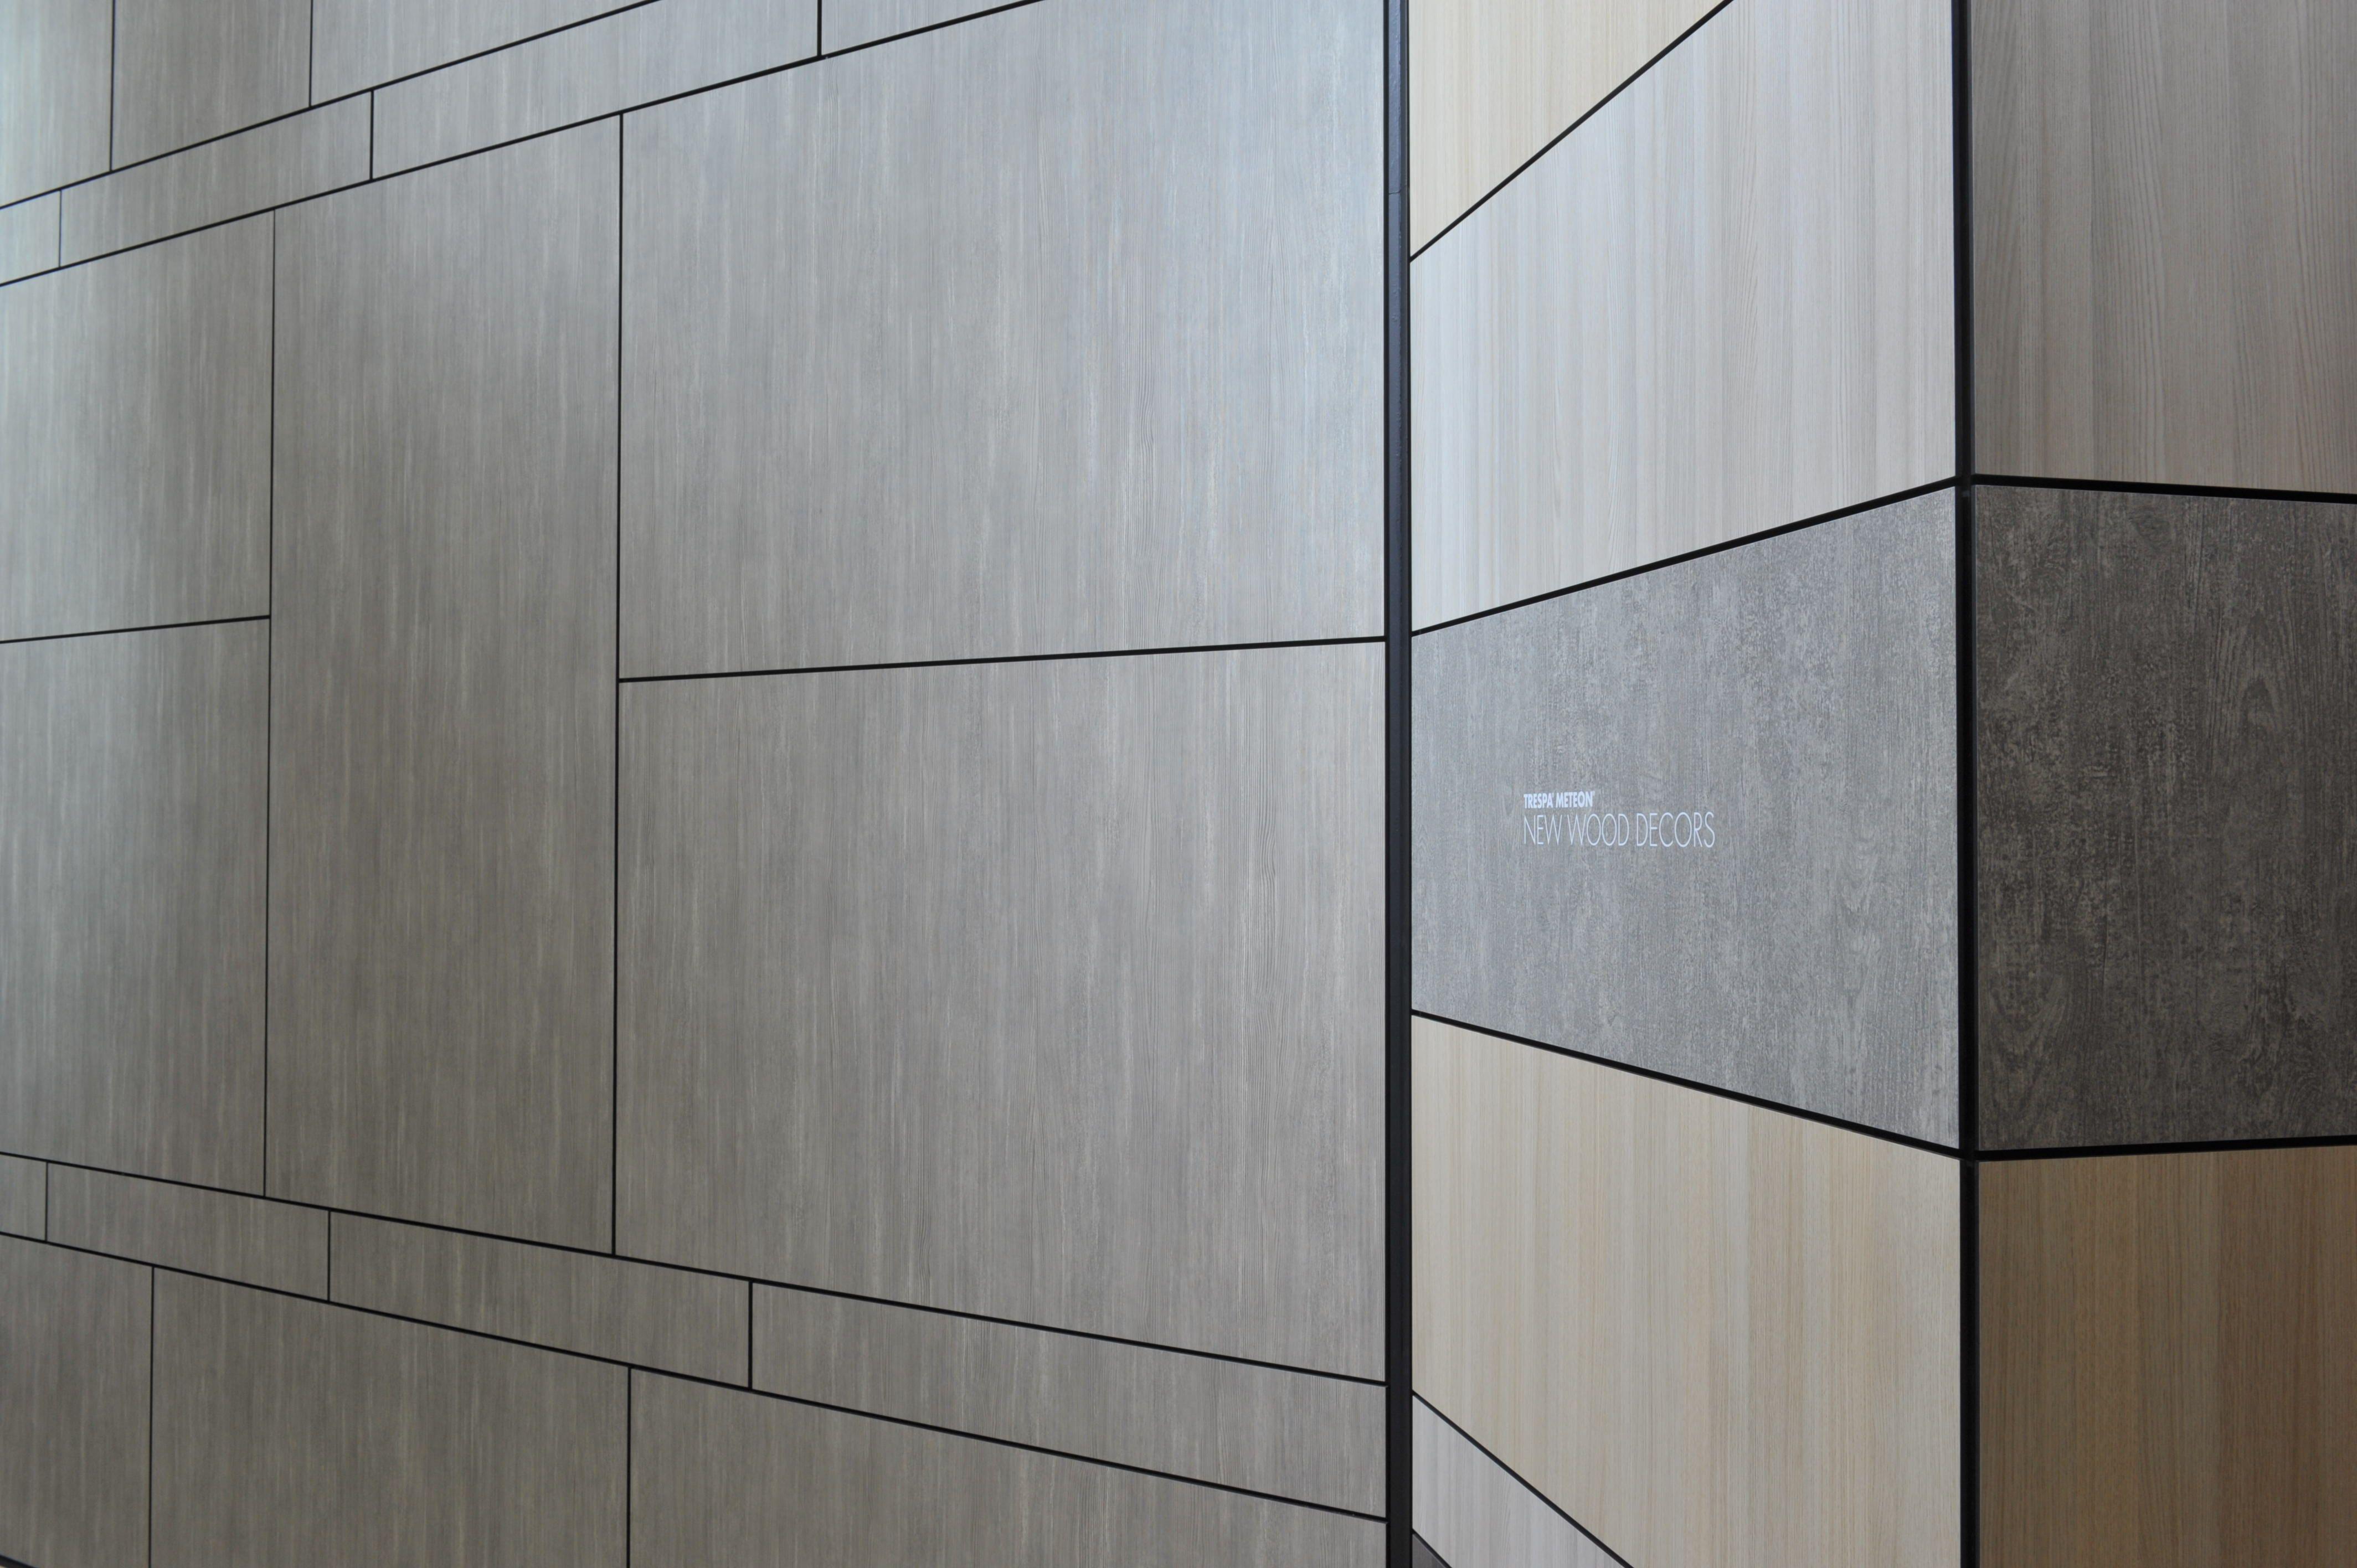 new trespa meteon wood decors - Medium Hardwood Hotel 2015